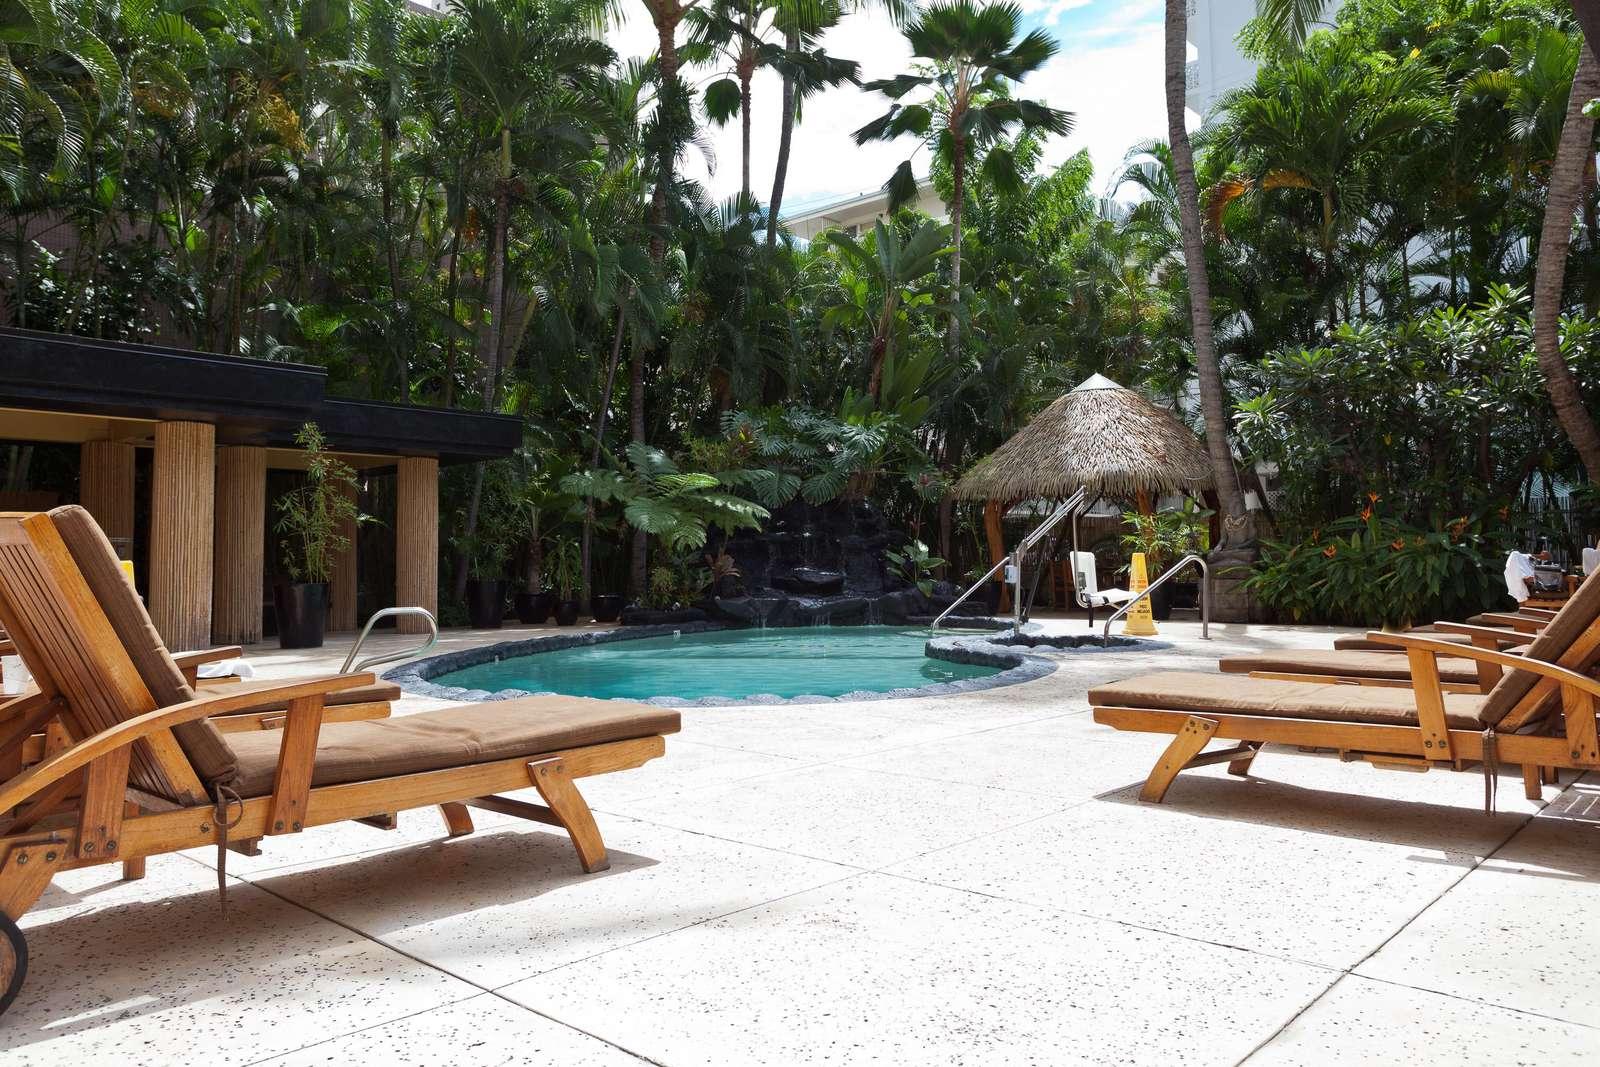 An Oasis in the heart of Waikiki